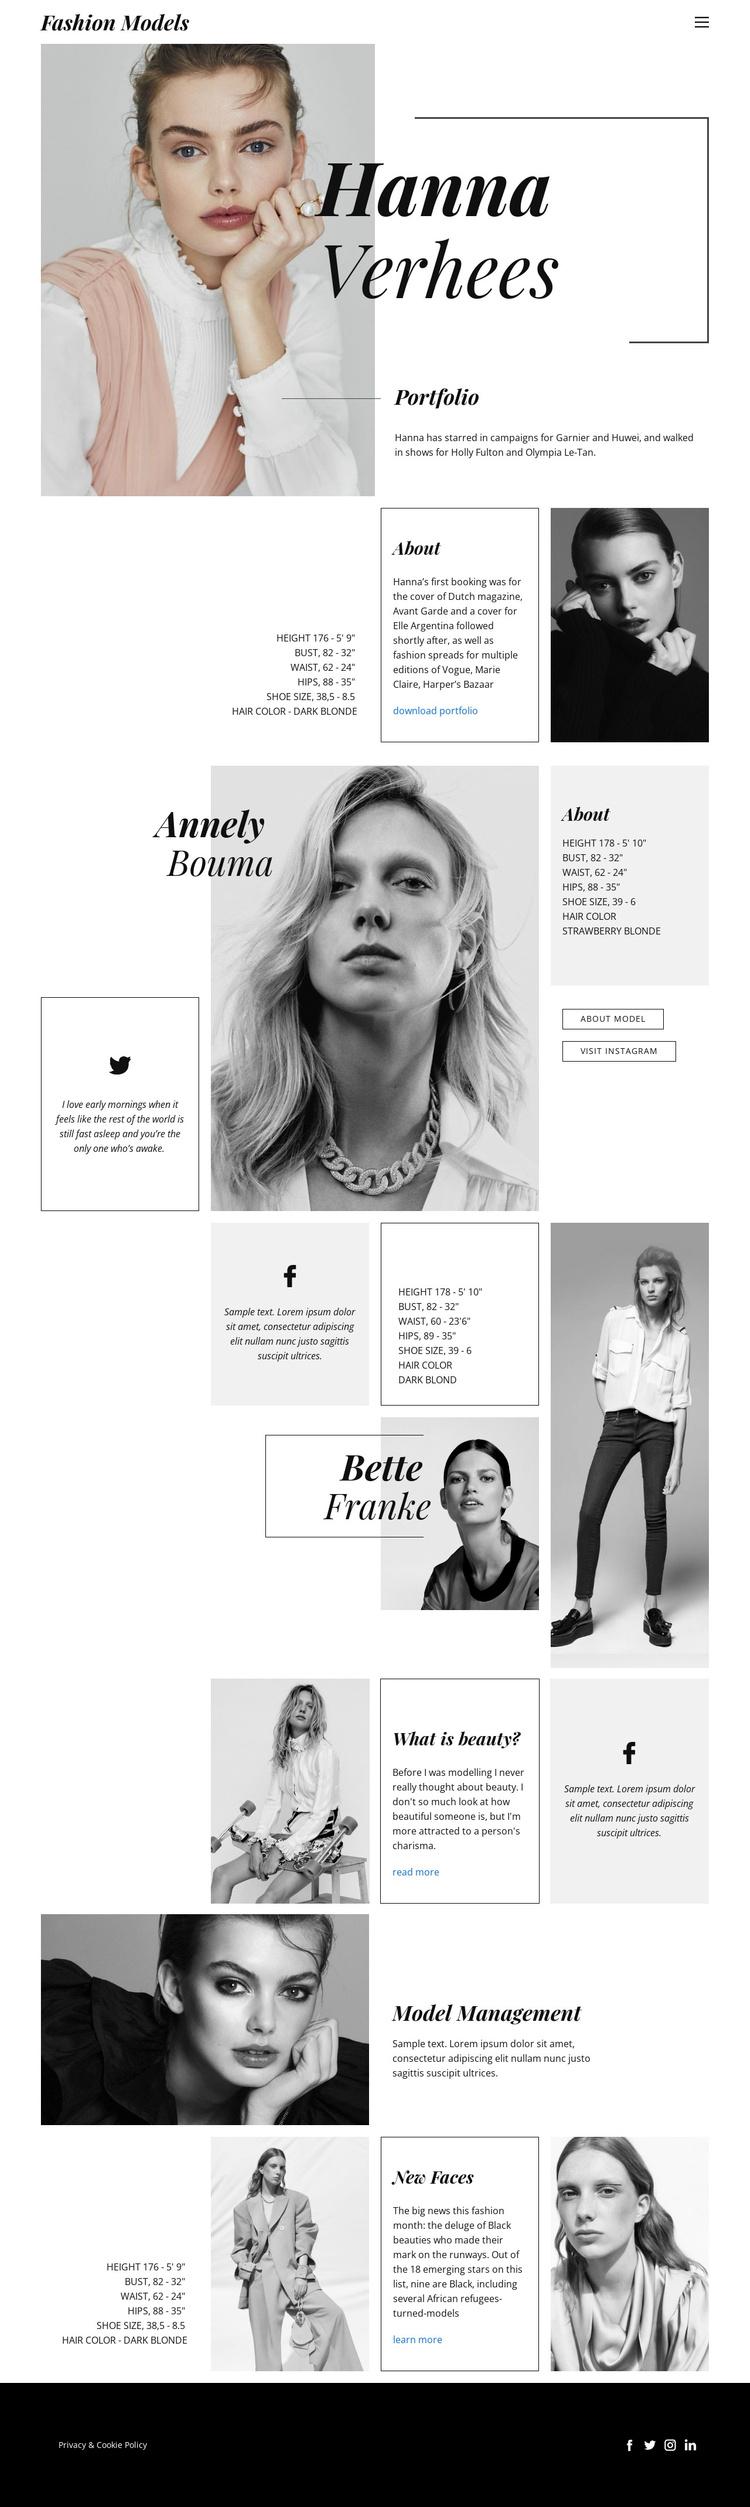 Hanna Verhees Blog Joomla Template